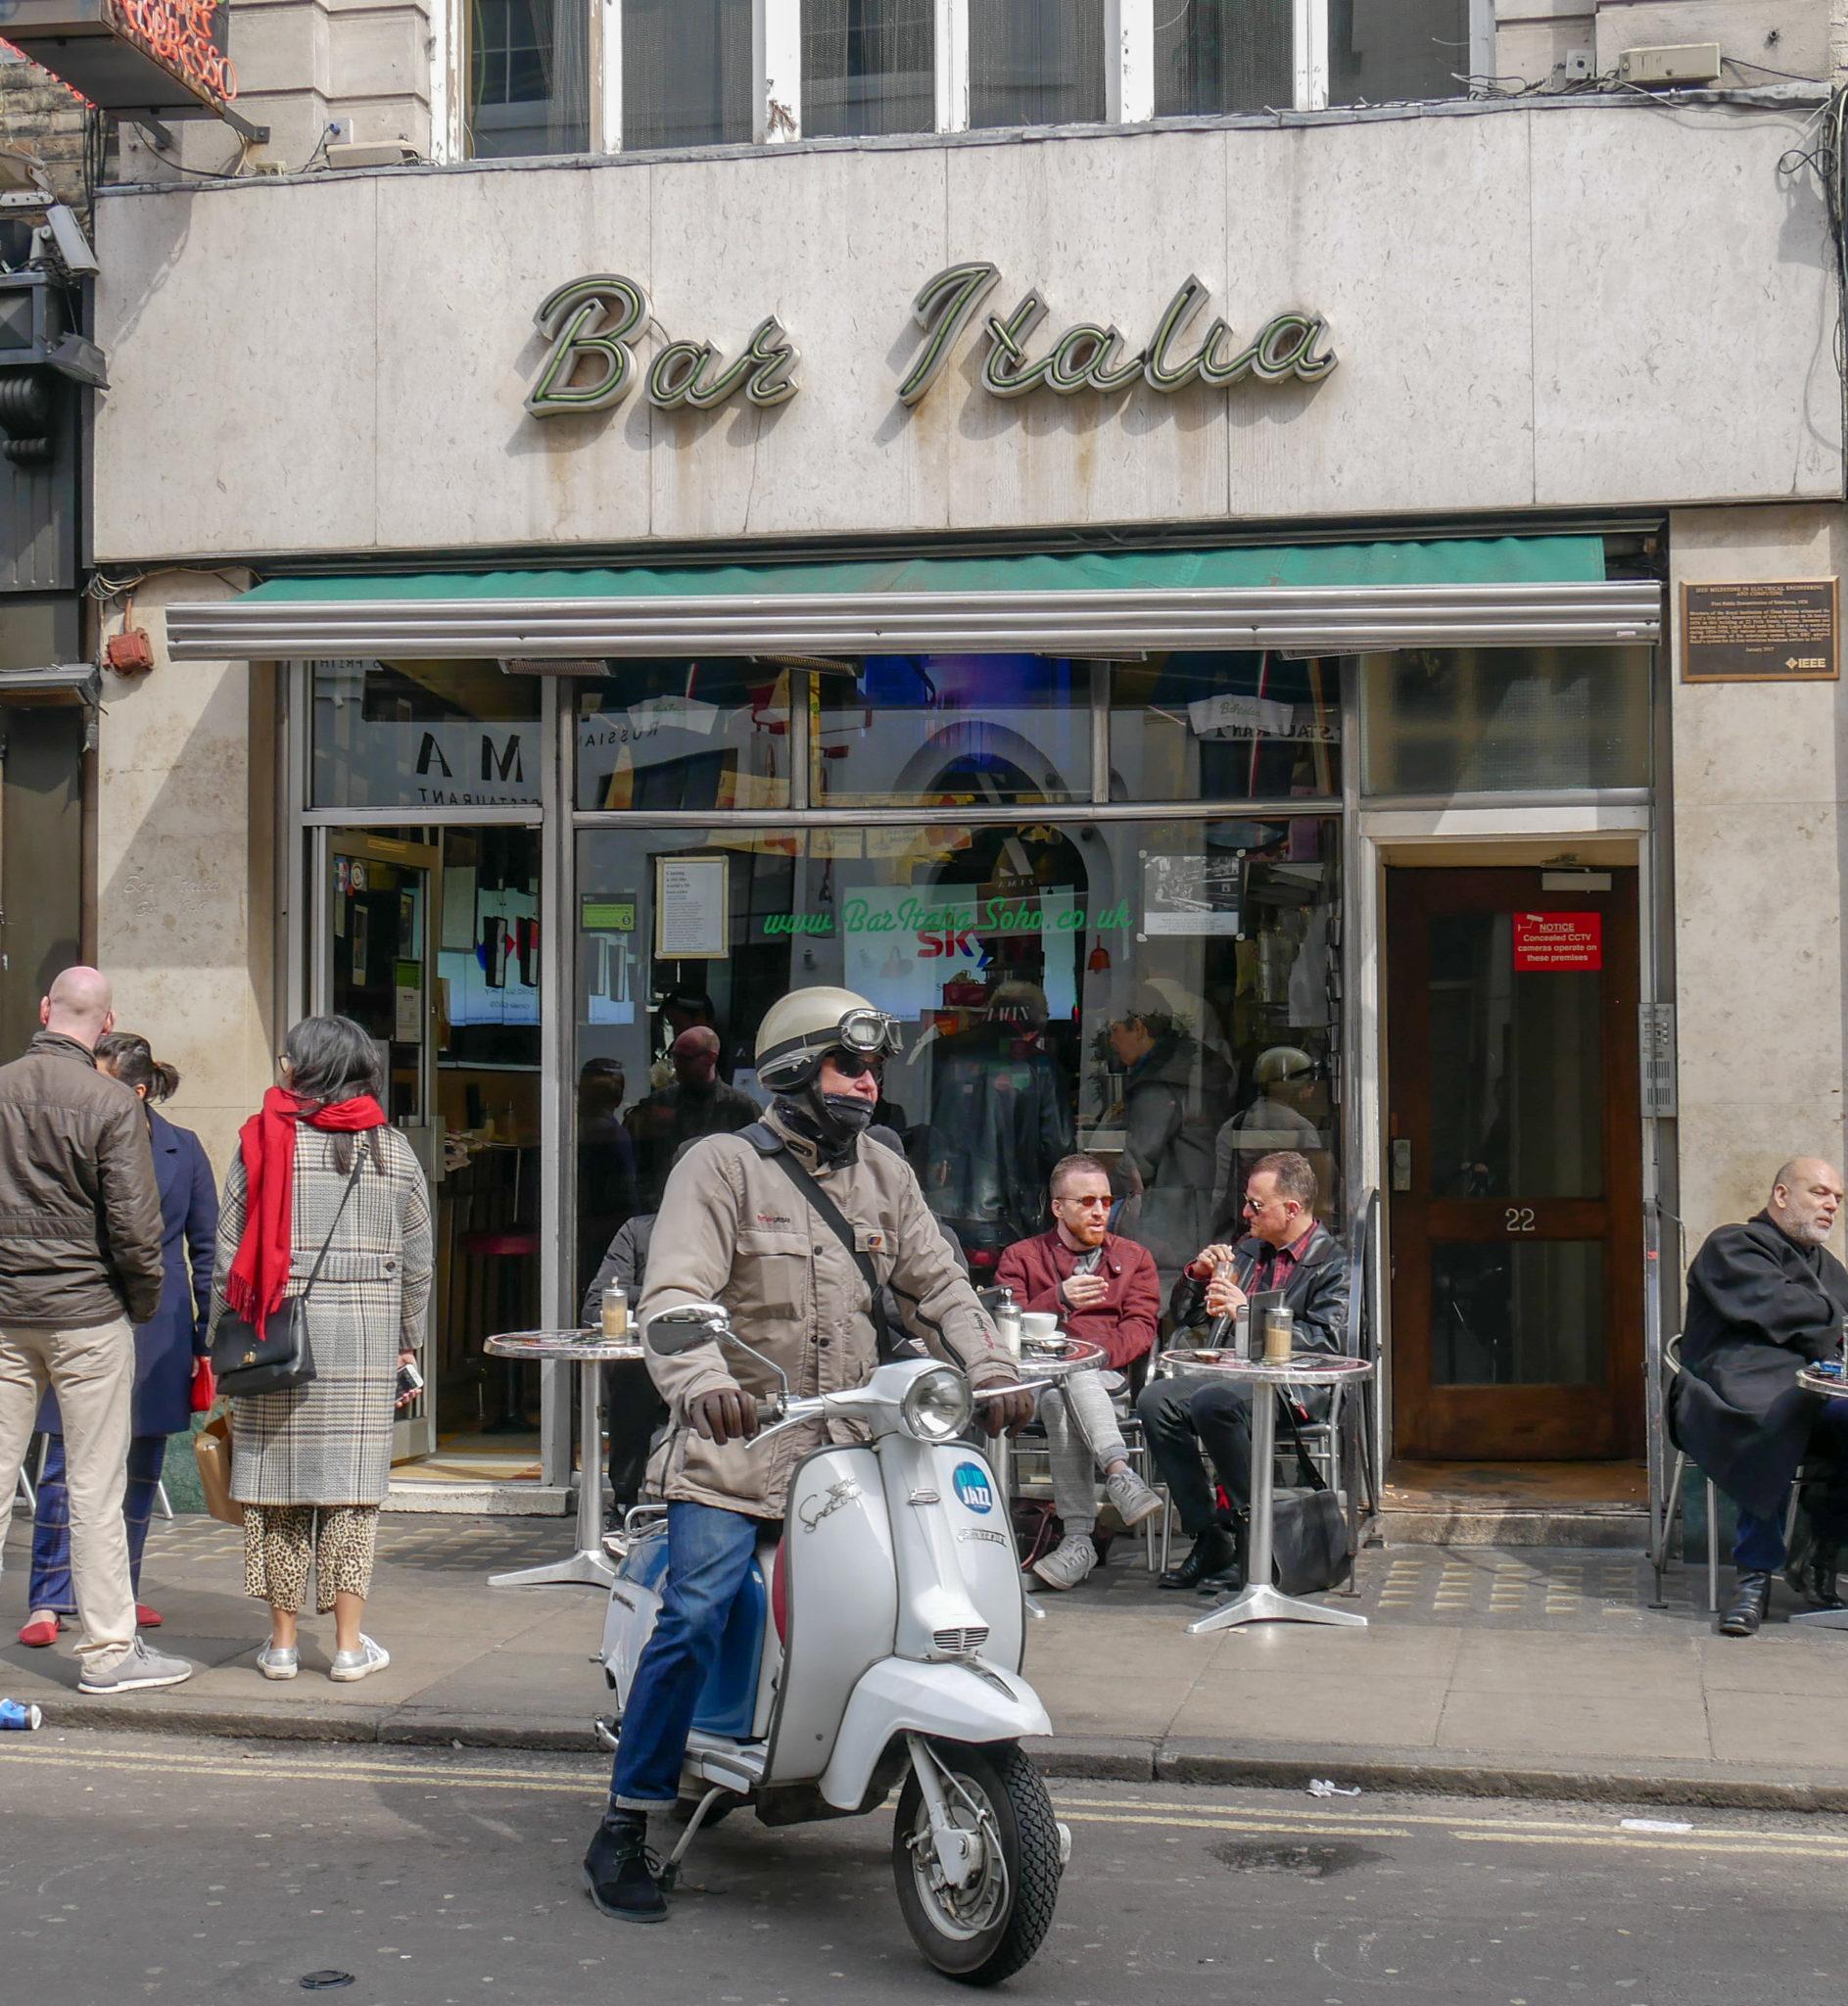 a man on a Vespa in front of Bar Italia, Soho, London